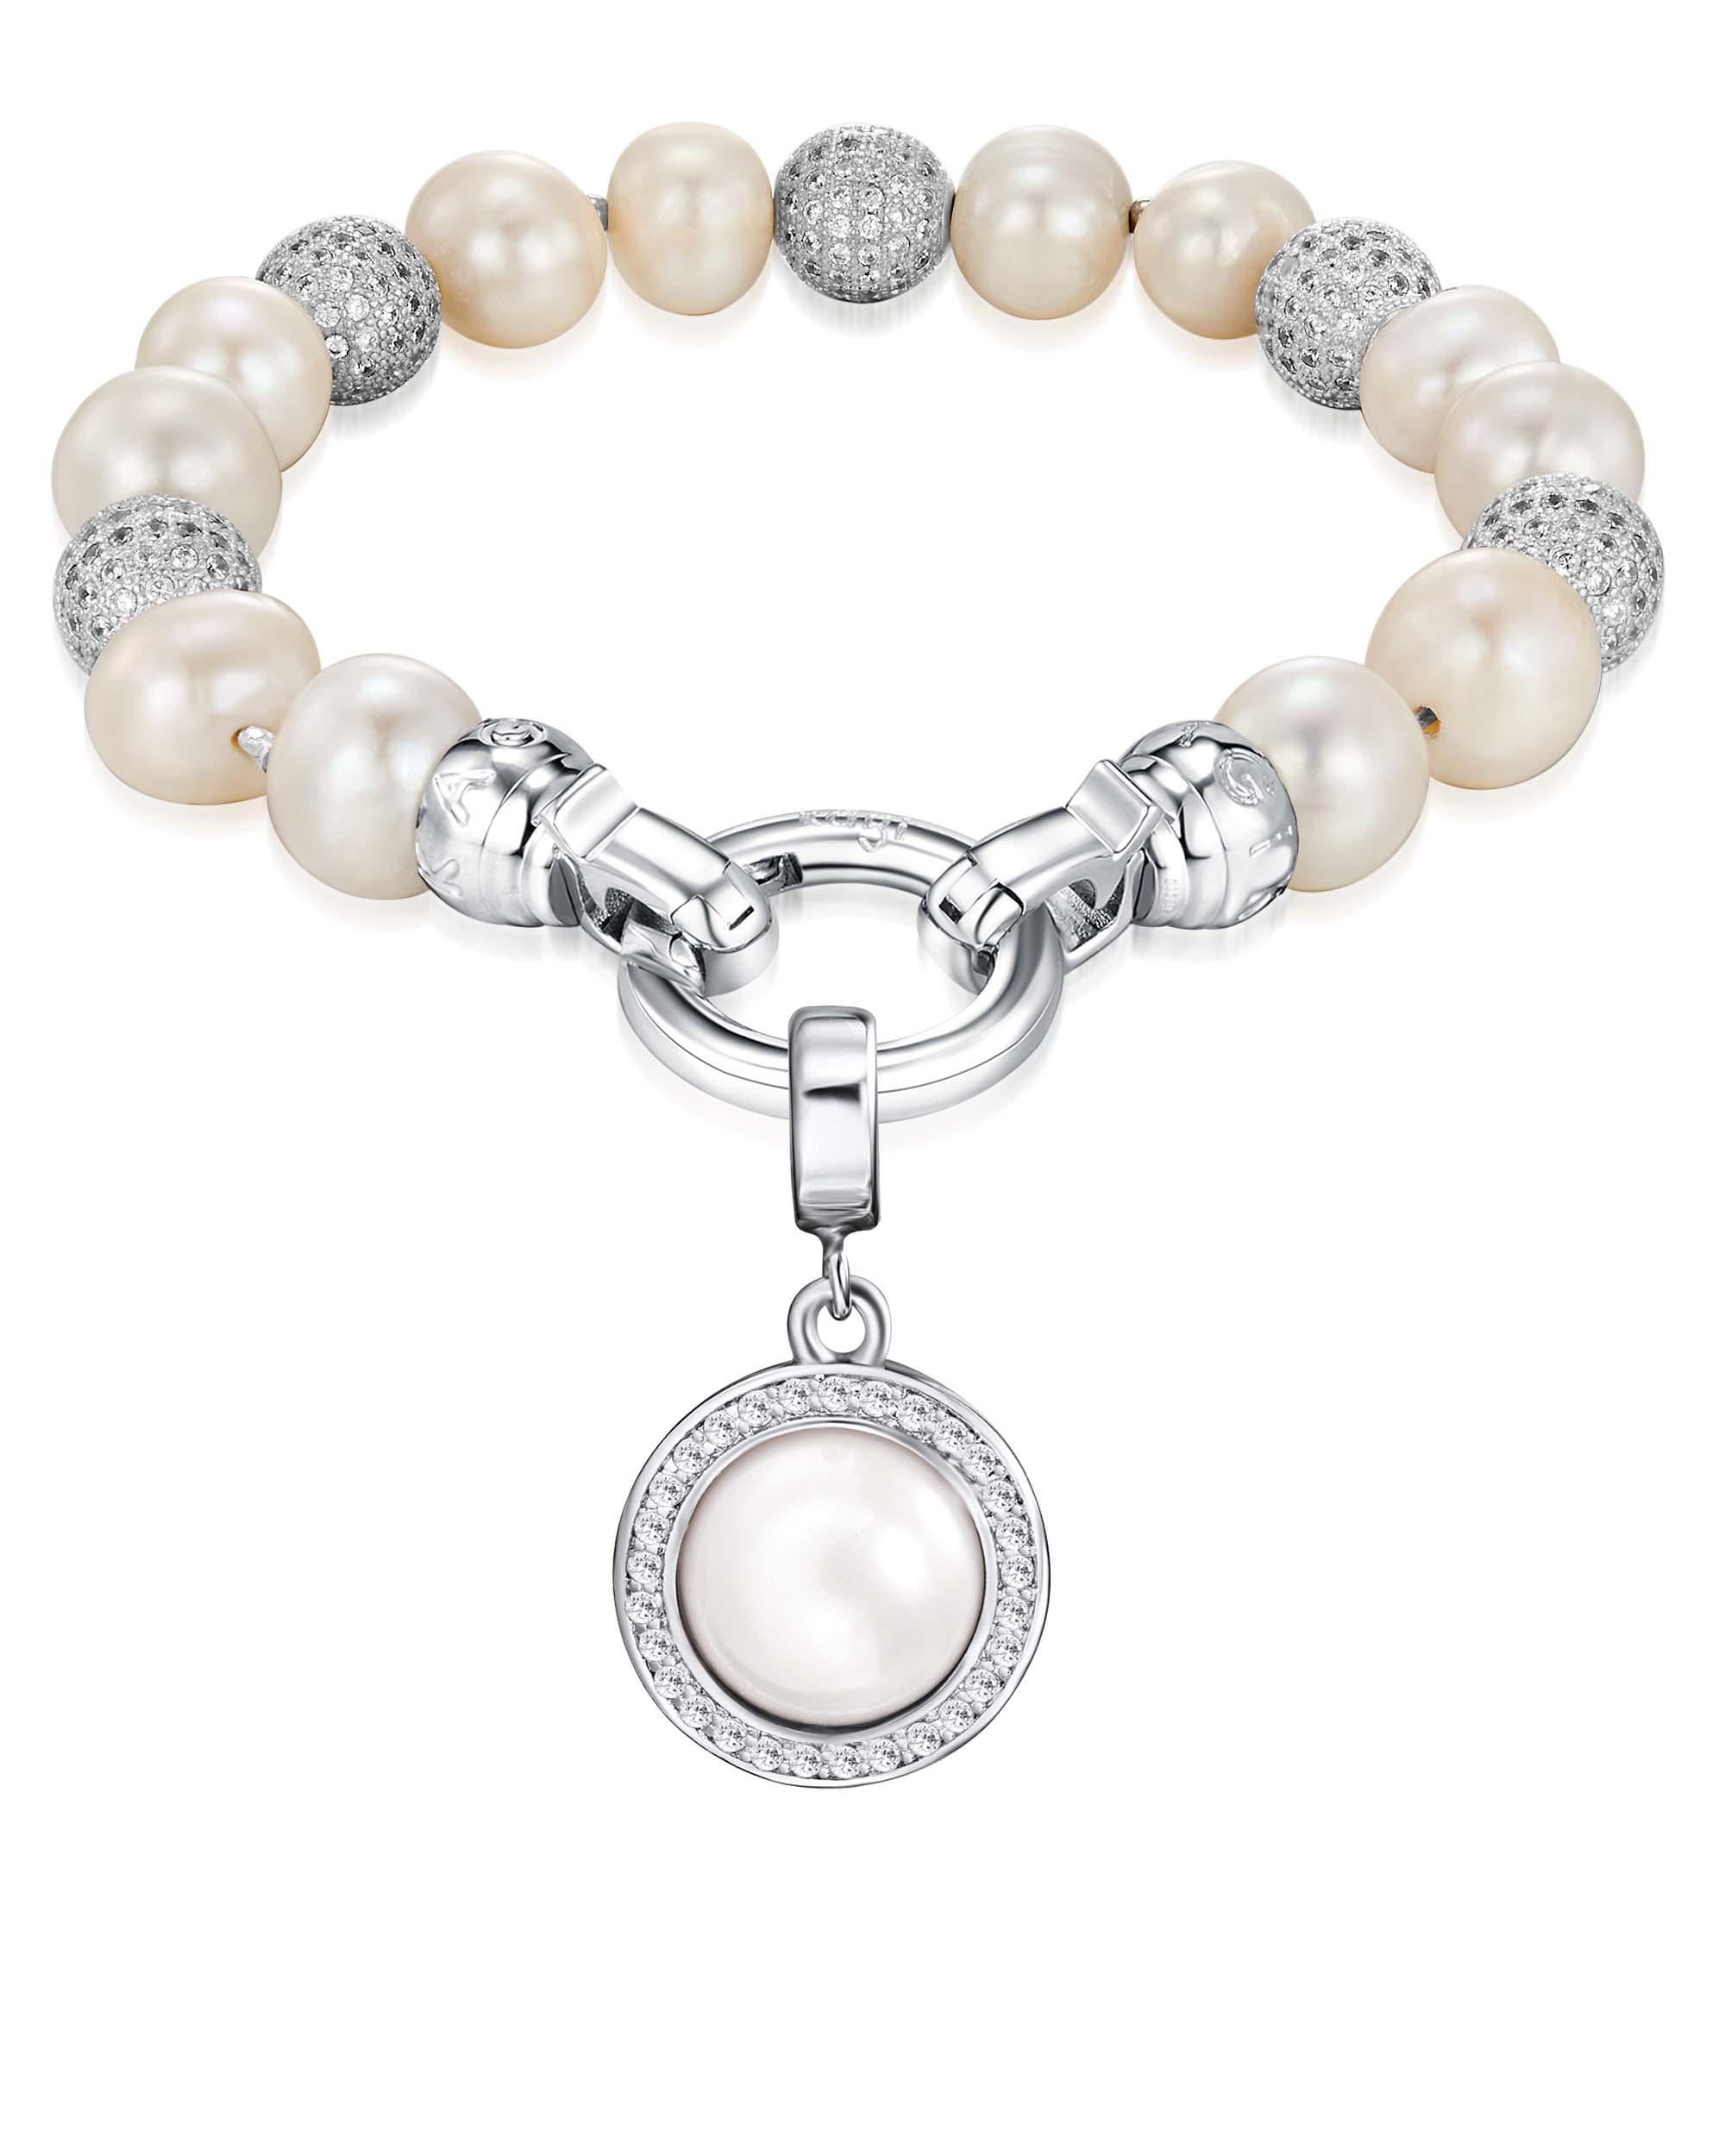 Kagi Pearl Luxe Bracelet with Pearl Orbit Small Pendant $119 www.kagi.net